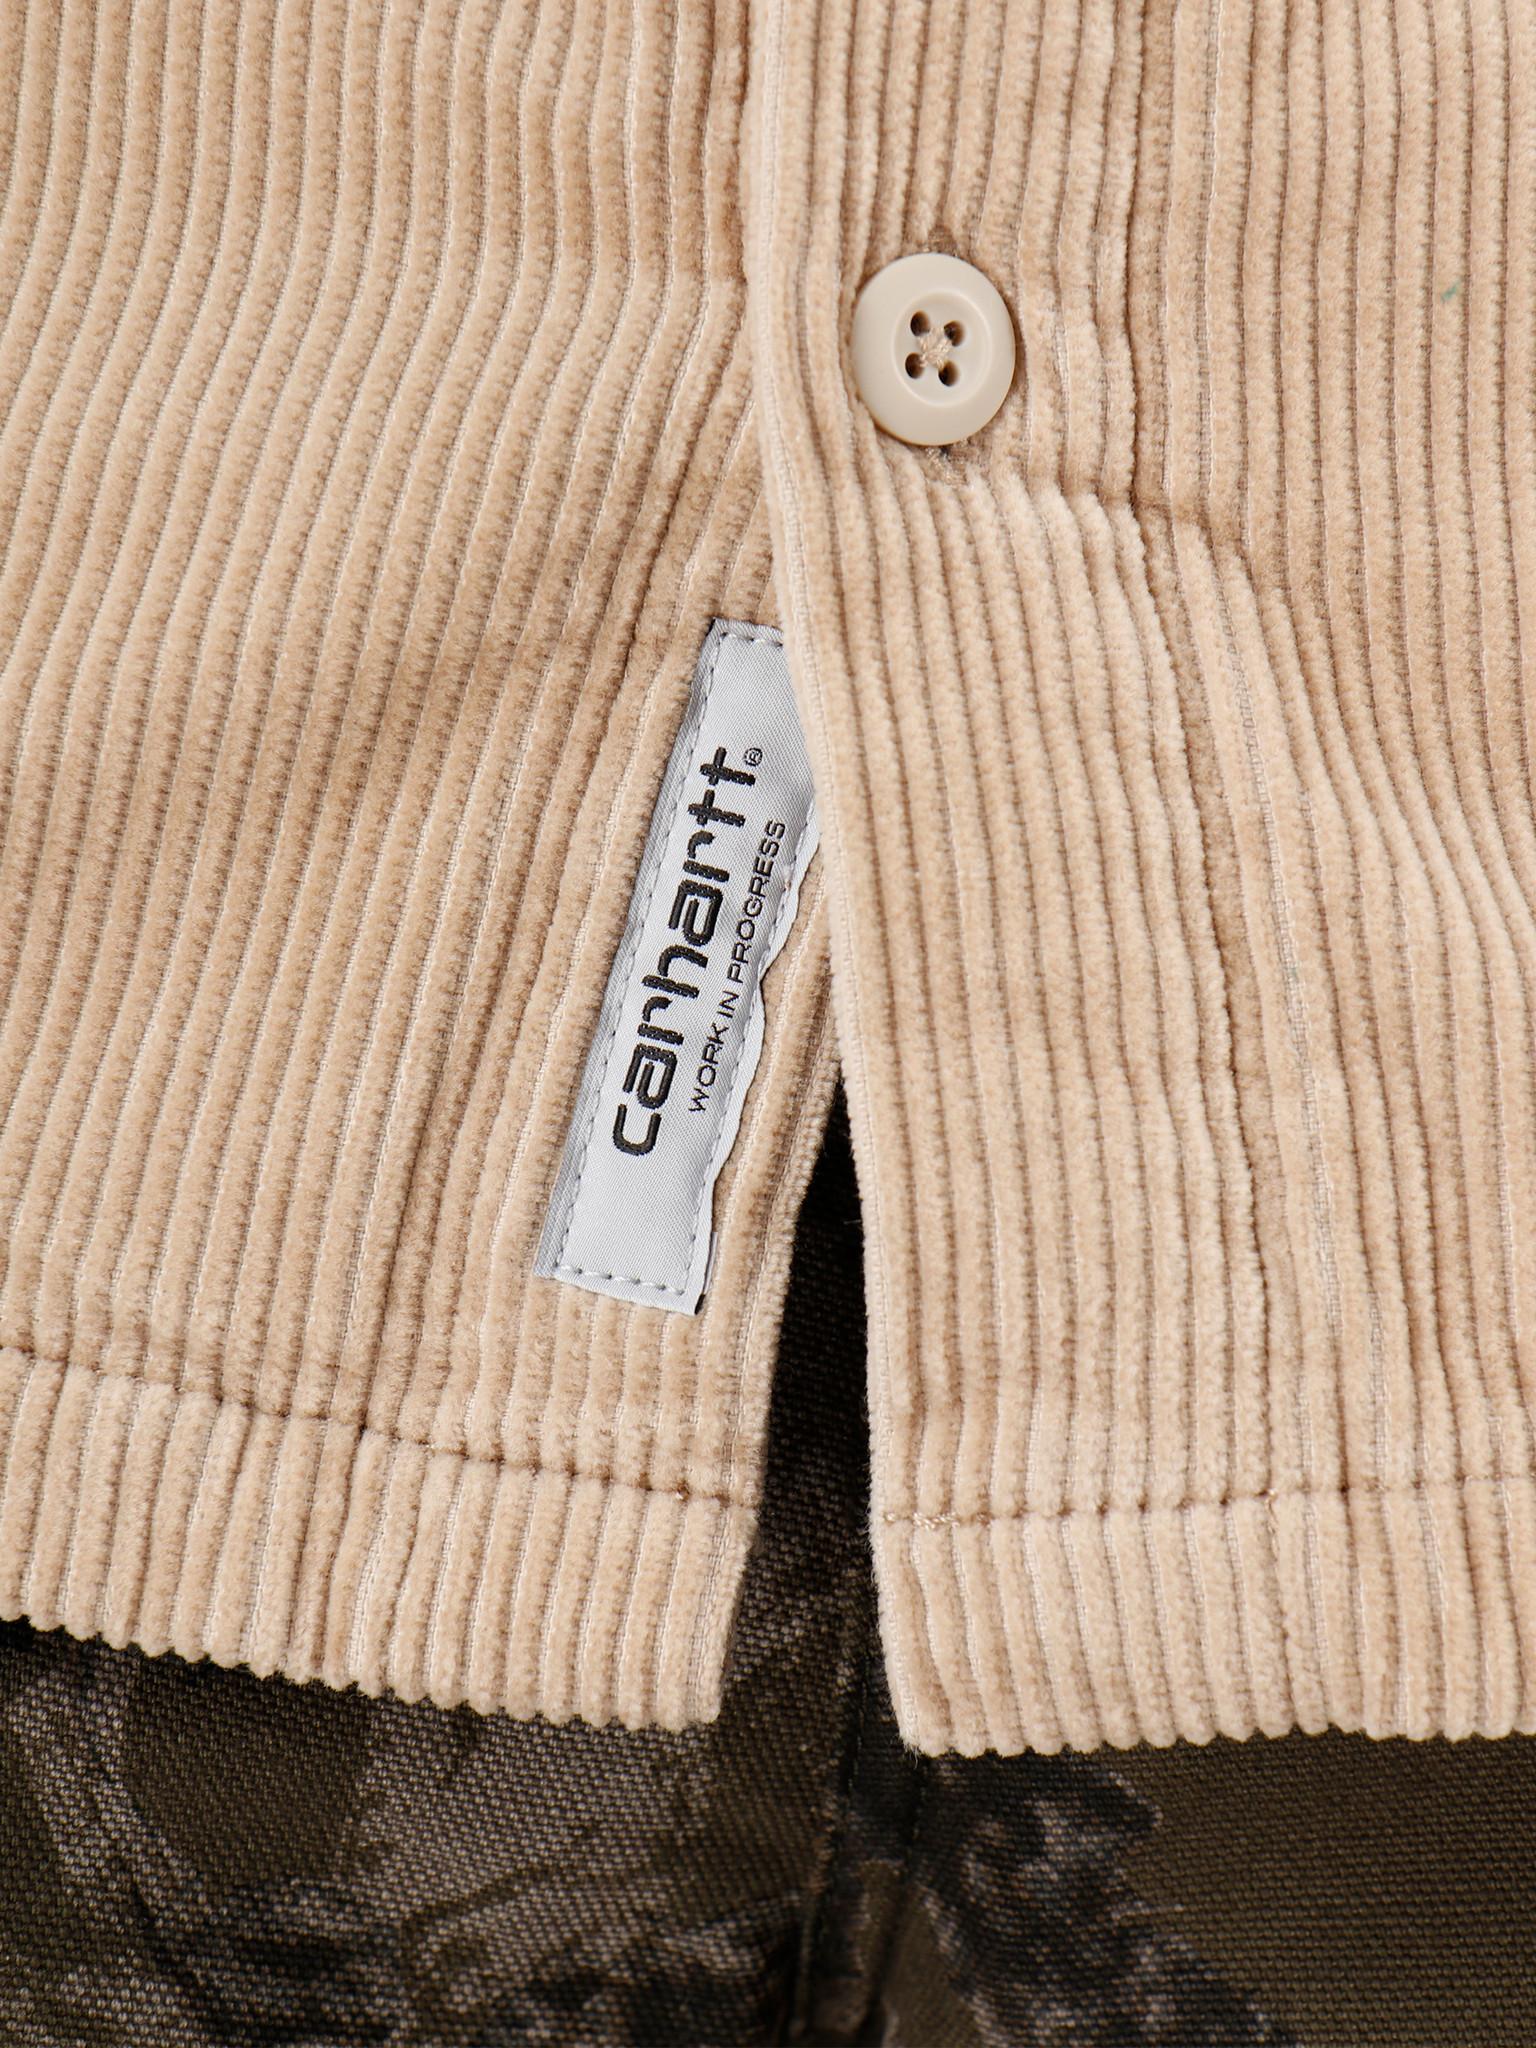 Carhartt WIP Carhartt WIP Whitsome Shirt Jacket Wall I026814